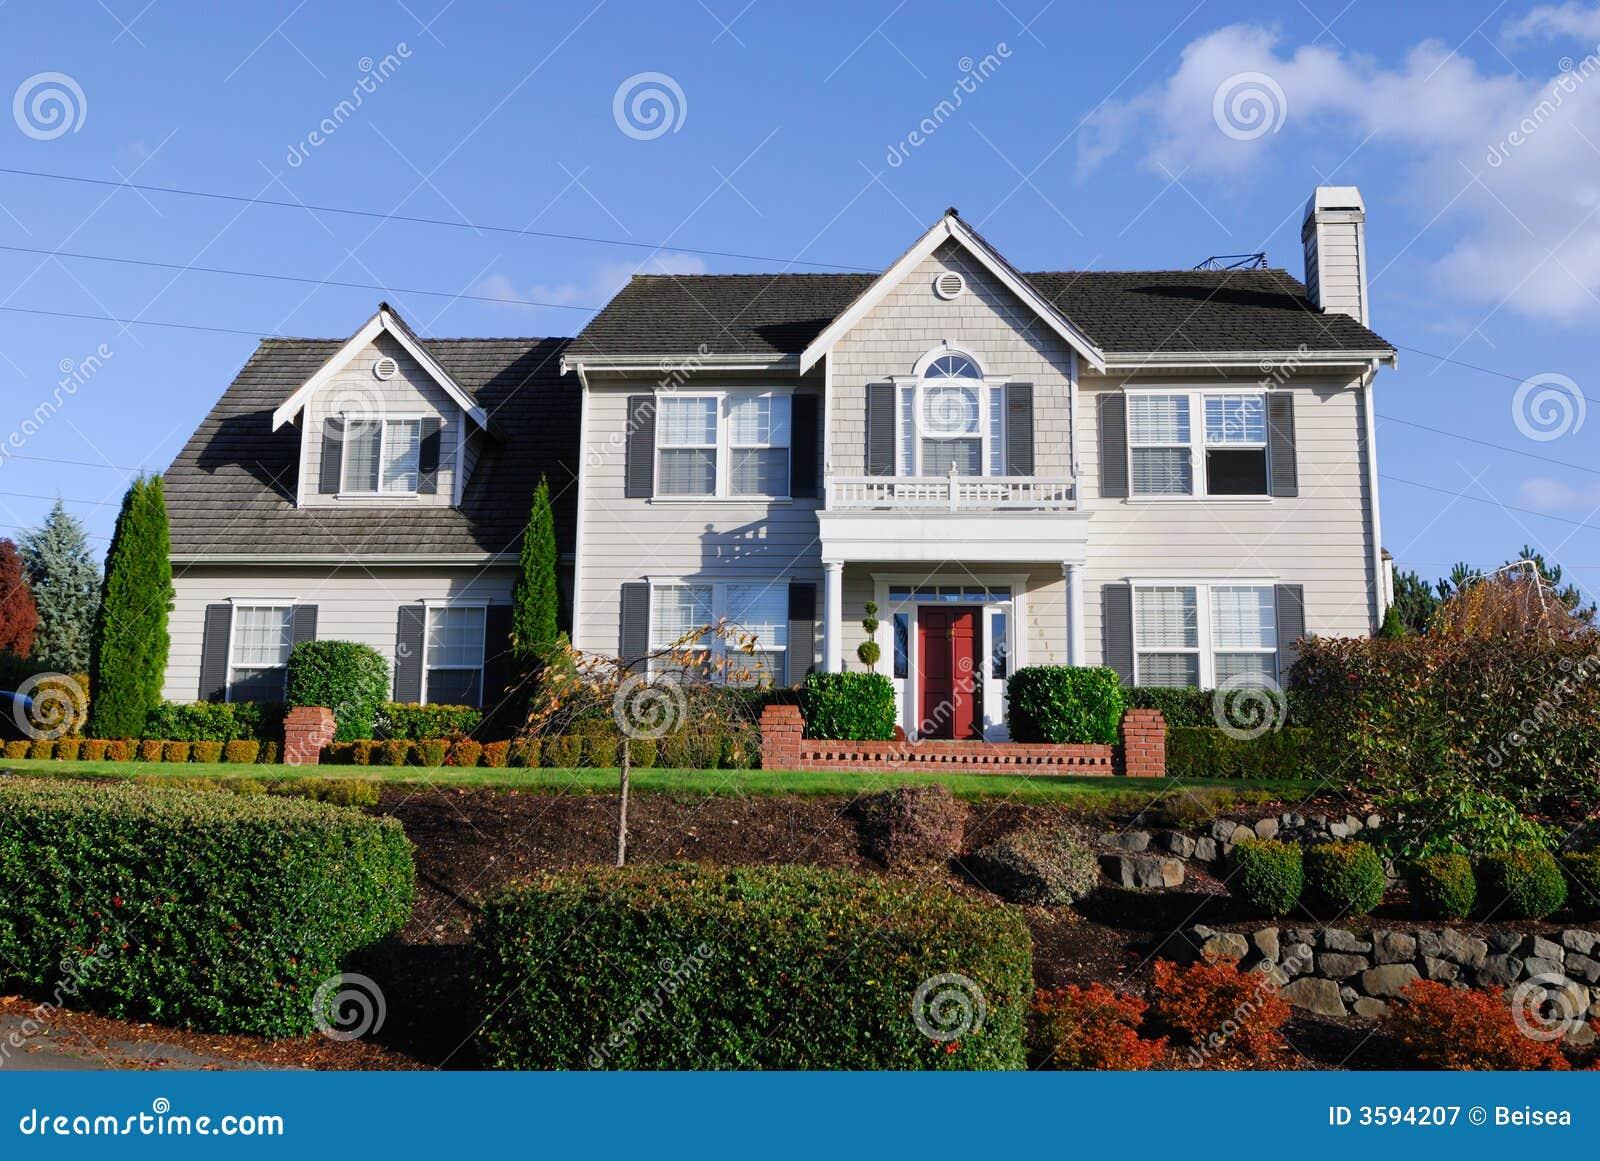 amerikanische haus serie iii lizenzfreie stockfotografie bild 3594207. Black Bedroom Furniture Sets. Home Design Ideas